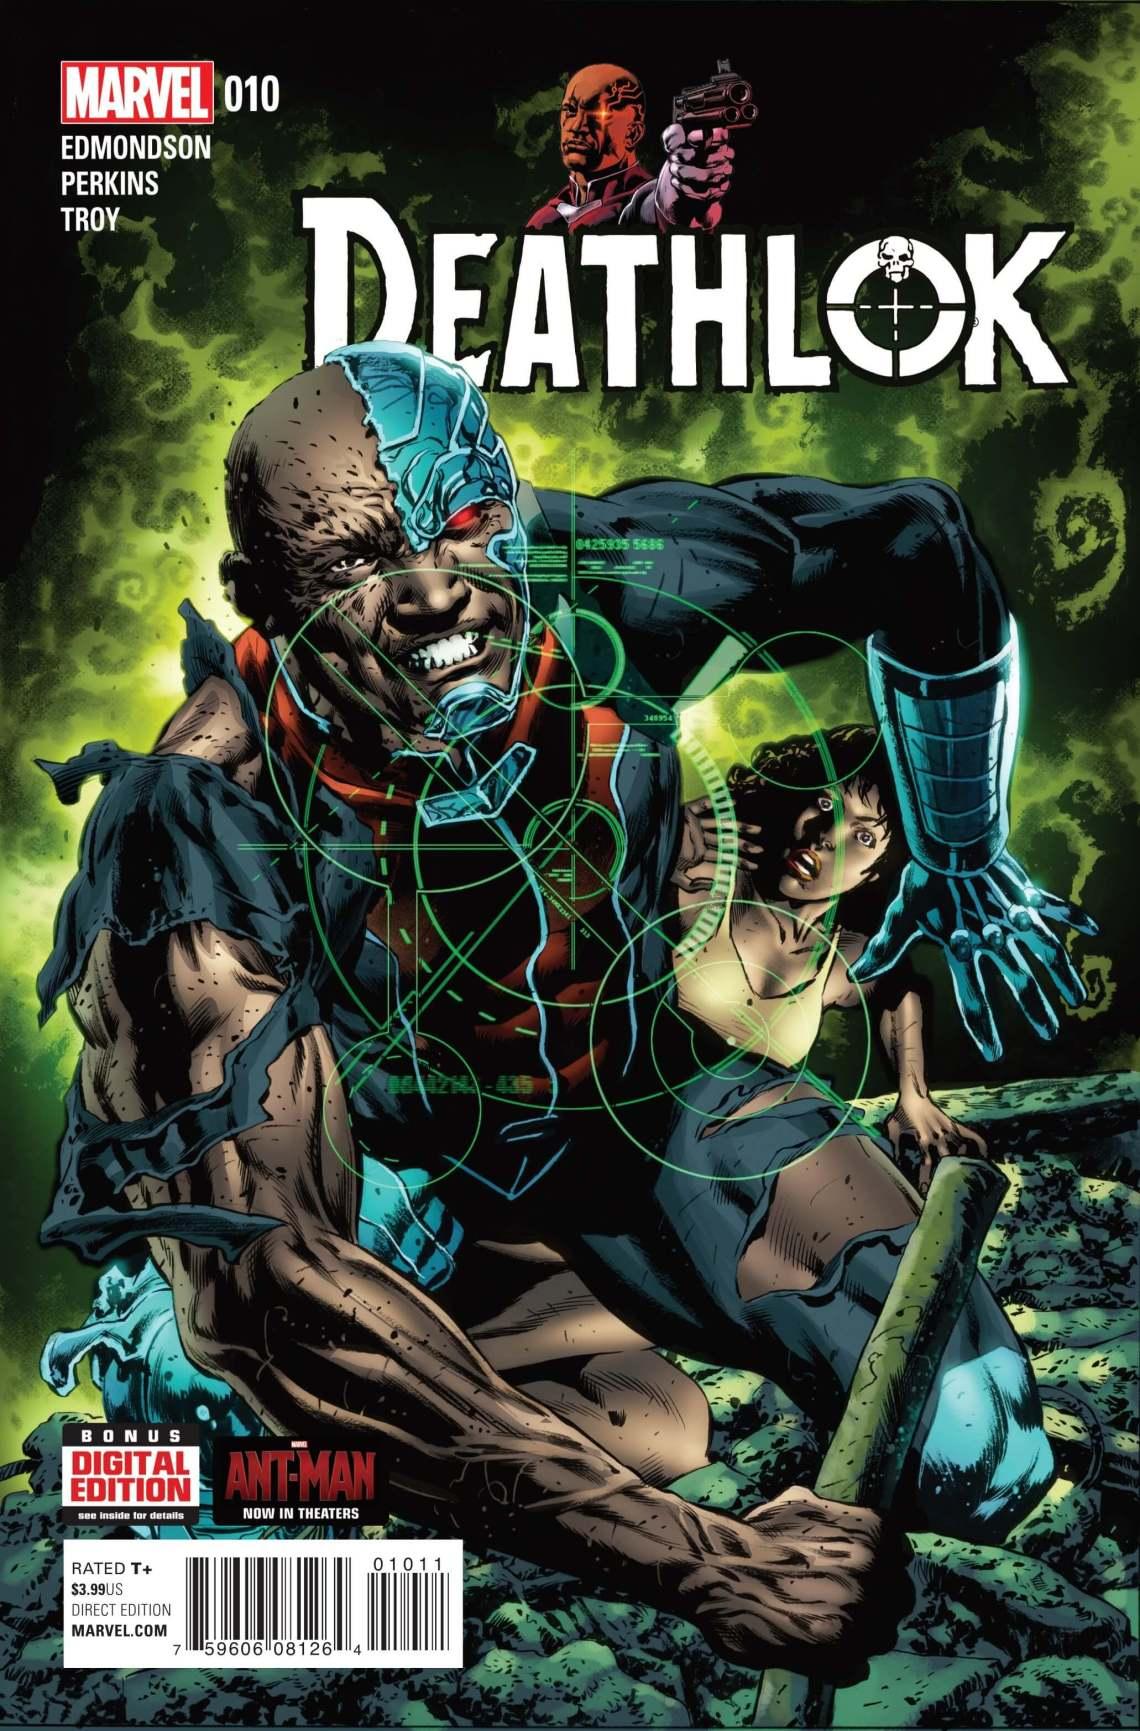 Deathlok010cvr